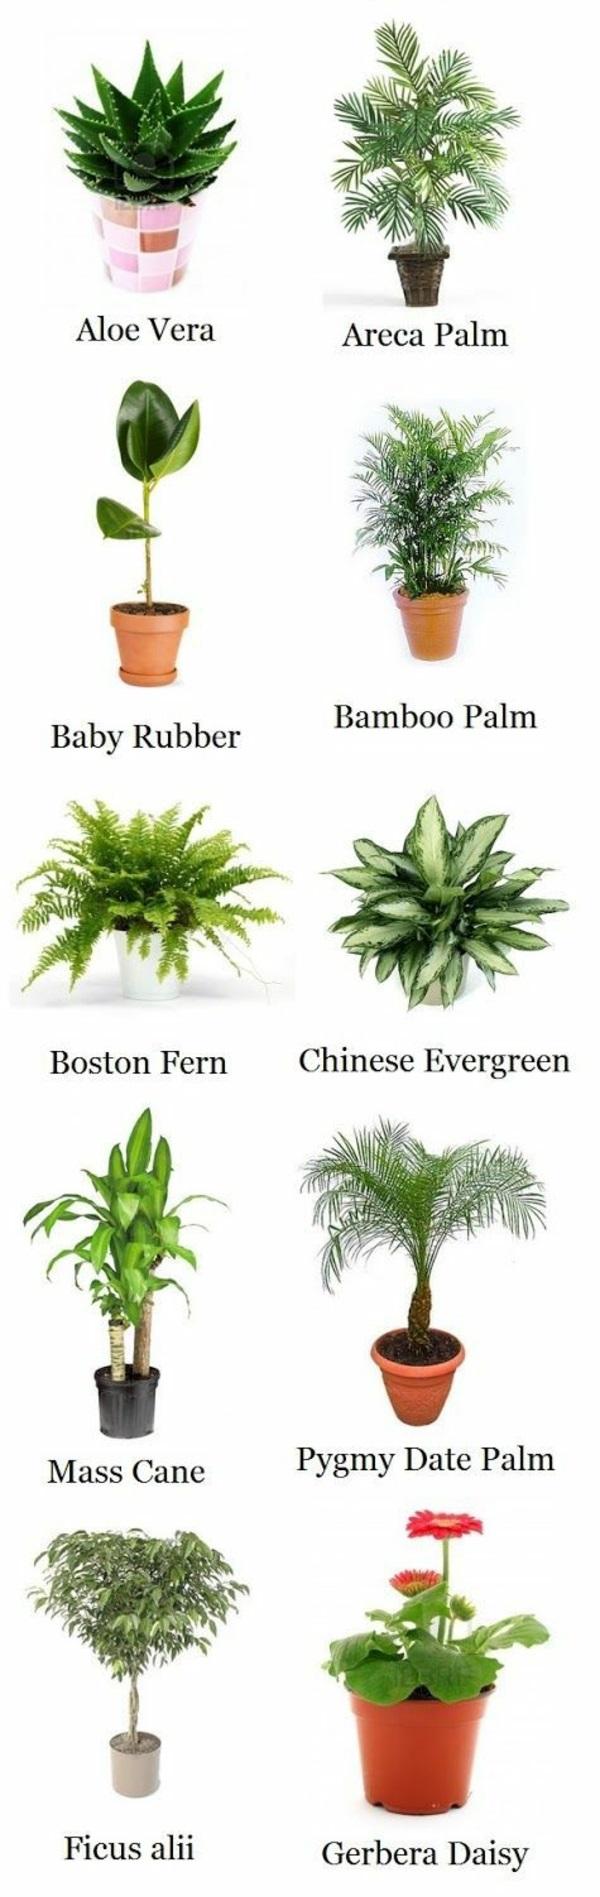 Palmenarten zimmerpflanzen rhapis excelsa geh rt zu den zimmerpalmen - Gartentrampolin stiftung warentest ...